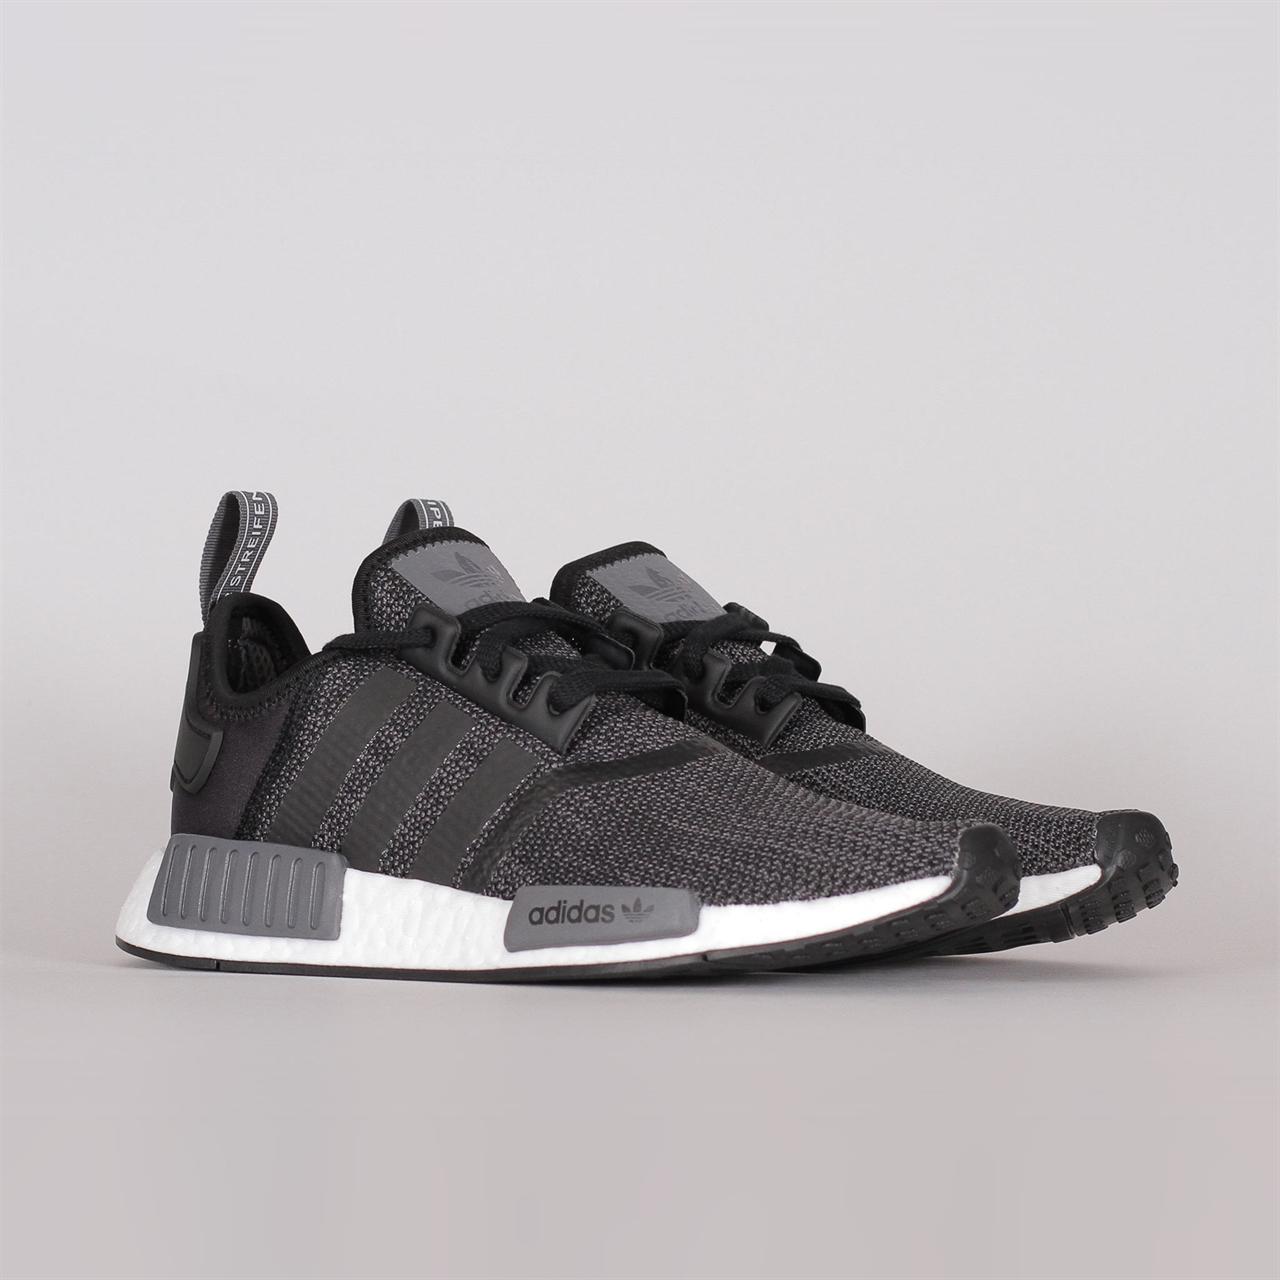 7714c0a5b Adidas Originals NMD R1 (B79758). 139EUR   a pair. Colorway  Core Black  Carbon Ftwr White